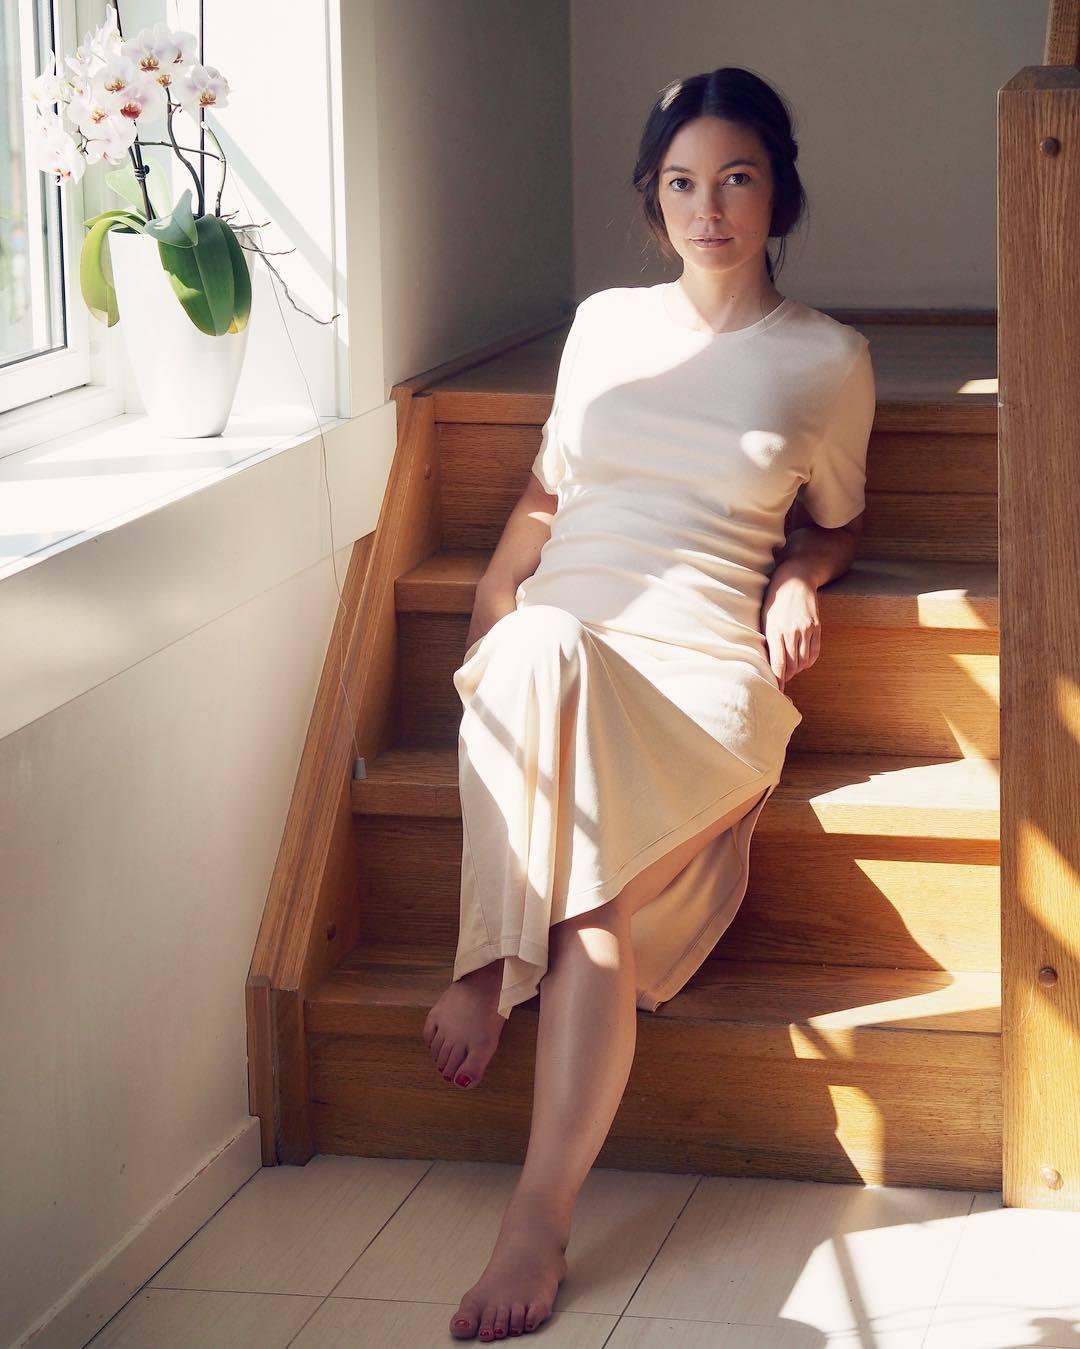 elisabeth-rasmussen-as-we-are-now-dress